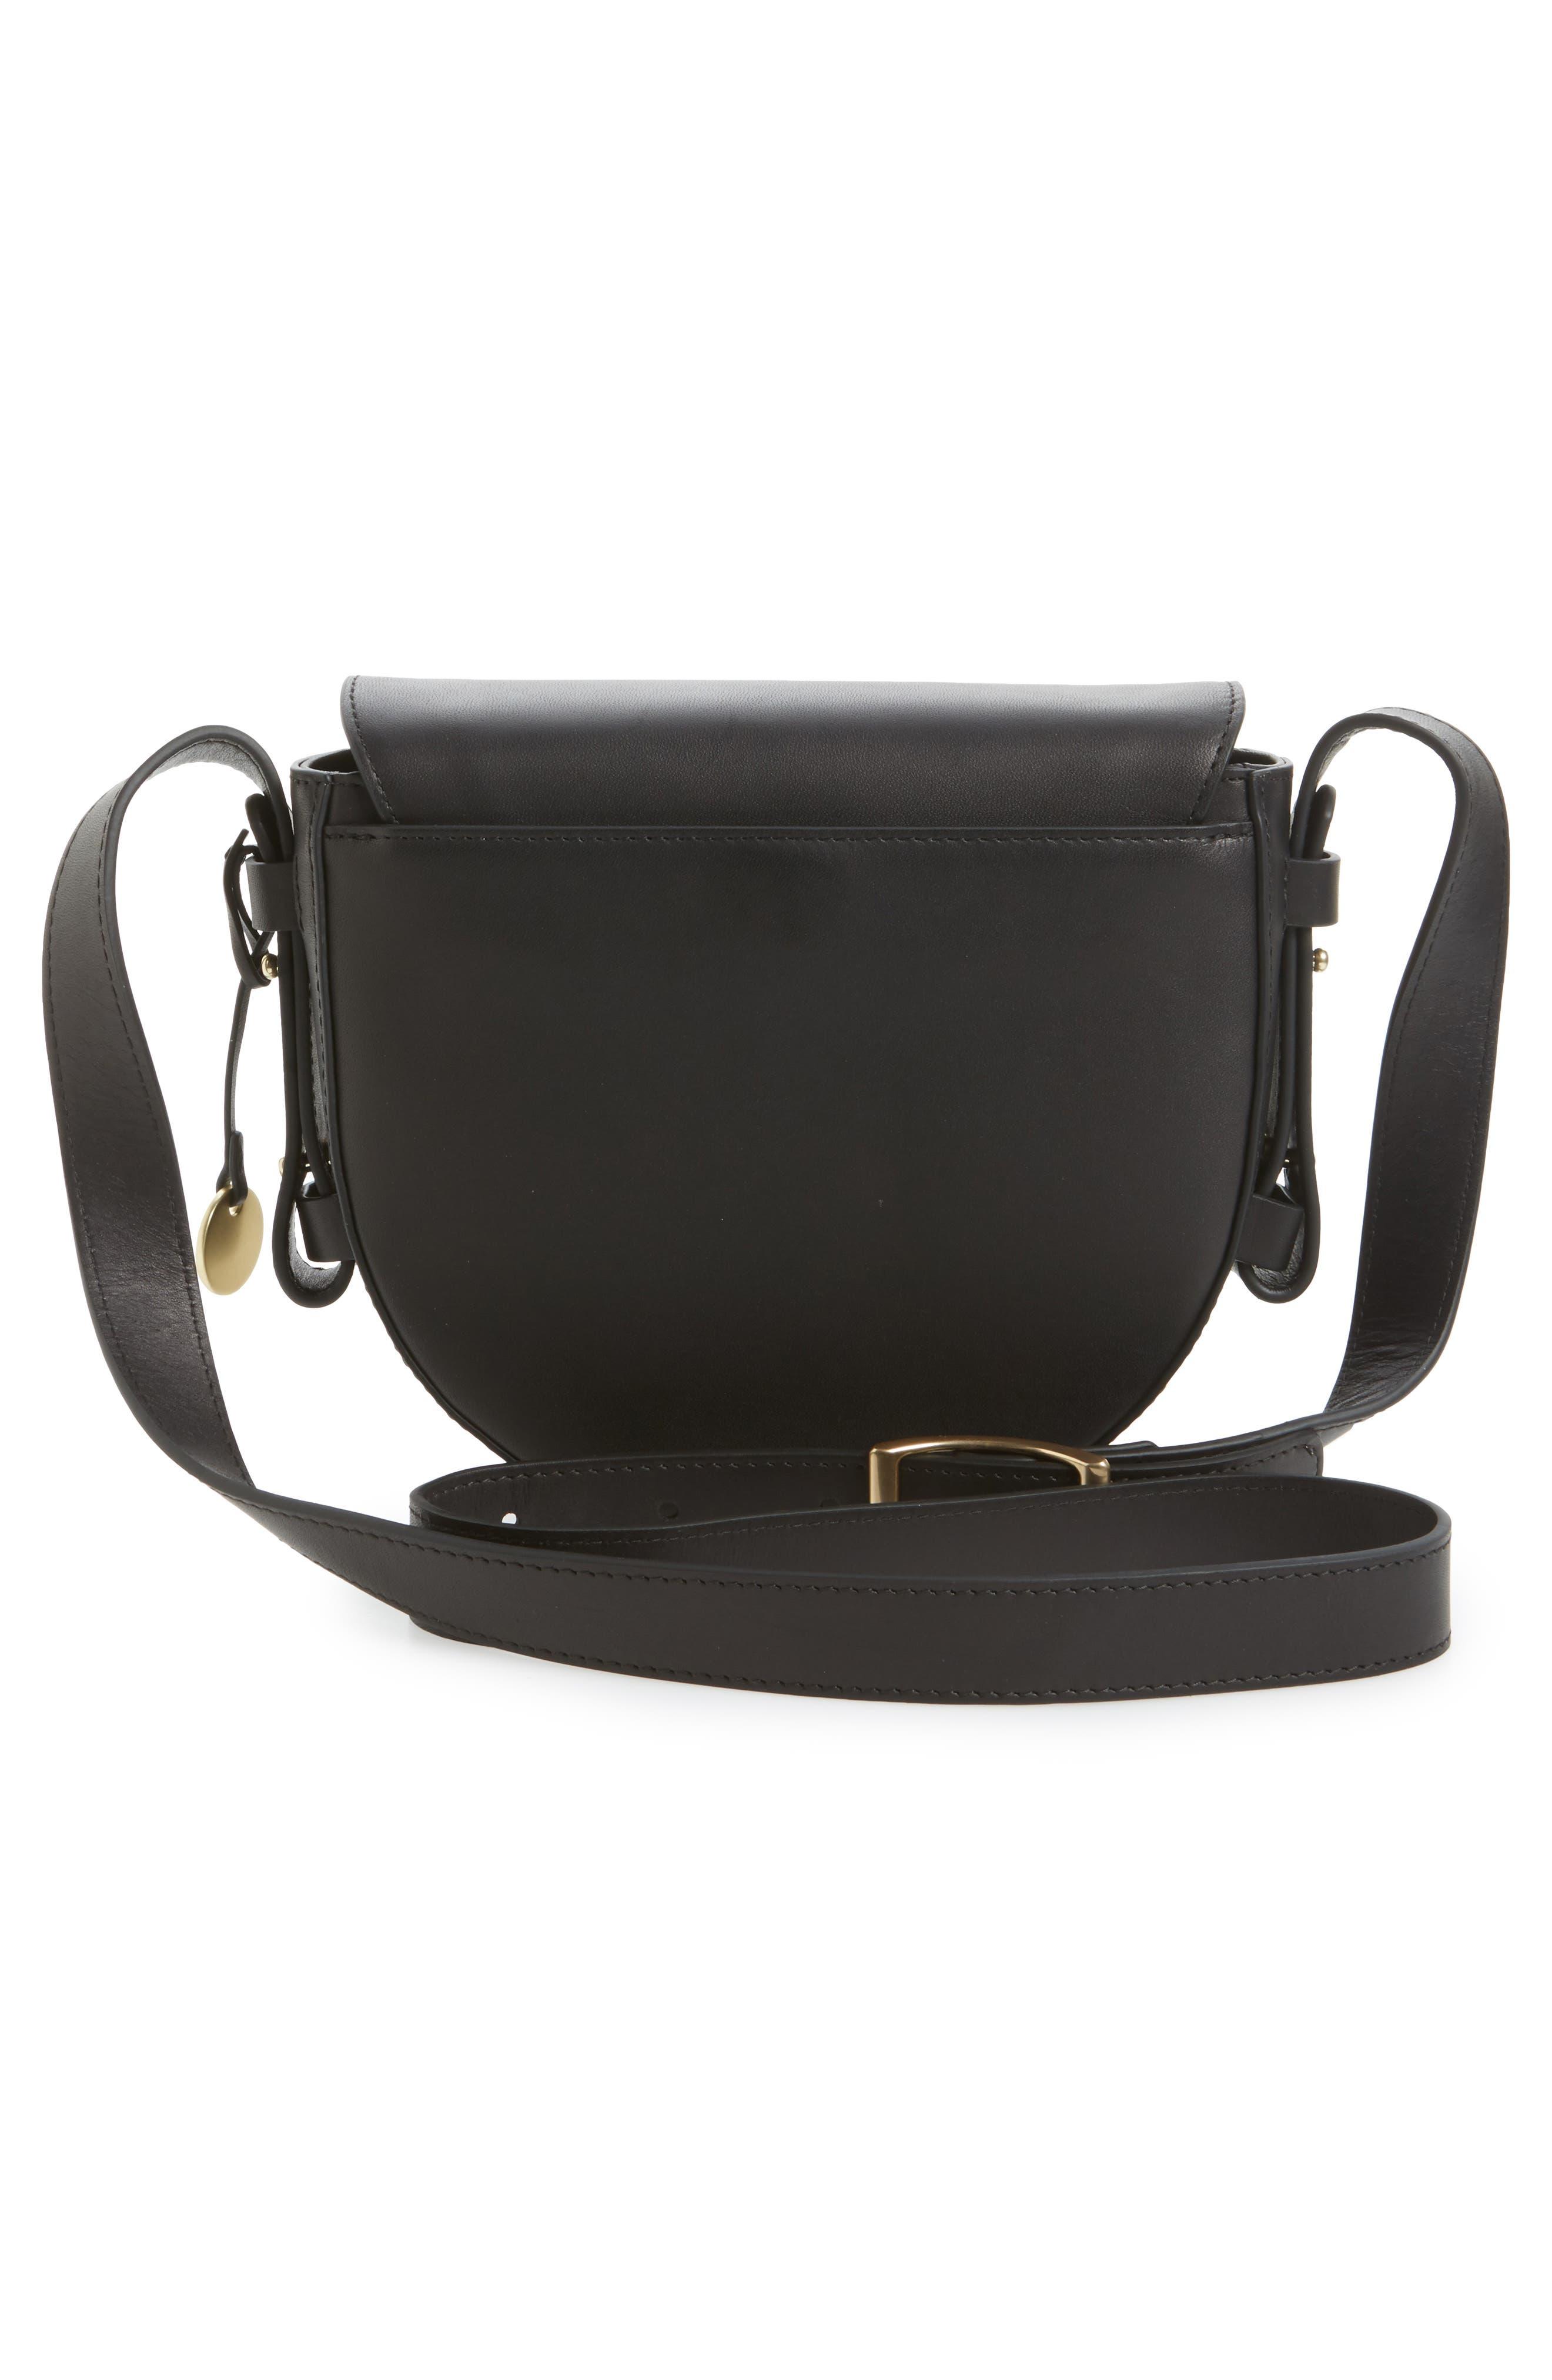 Lobelle Leather Saddle Bag,                             Alternate thumbnail 3, color,                             001